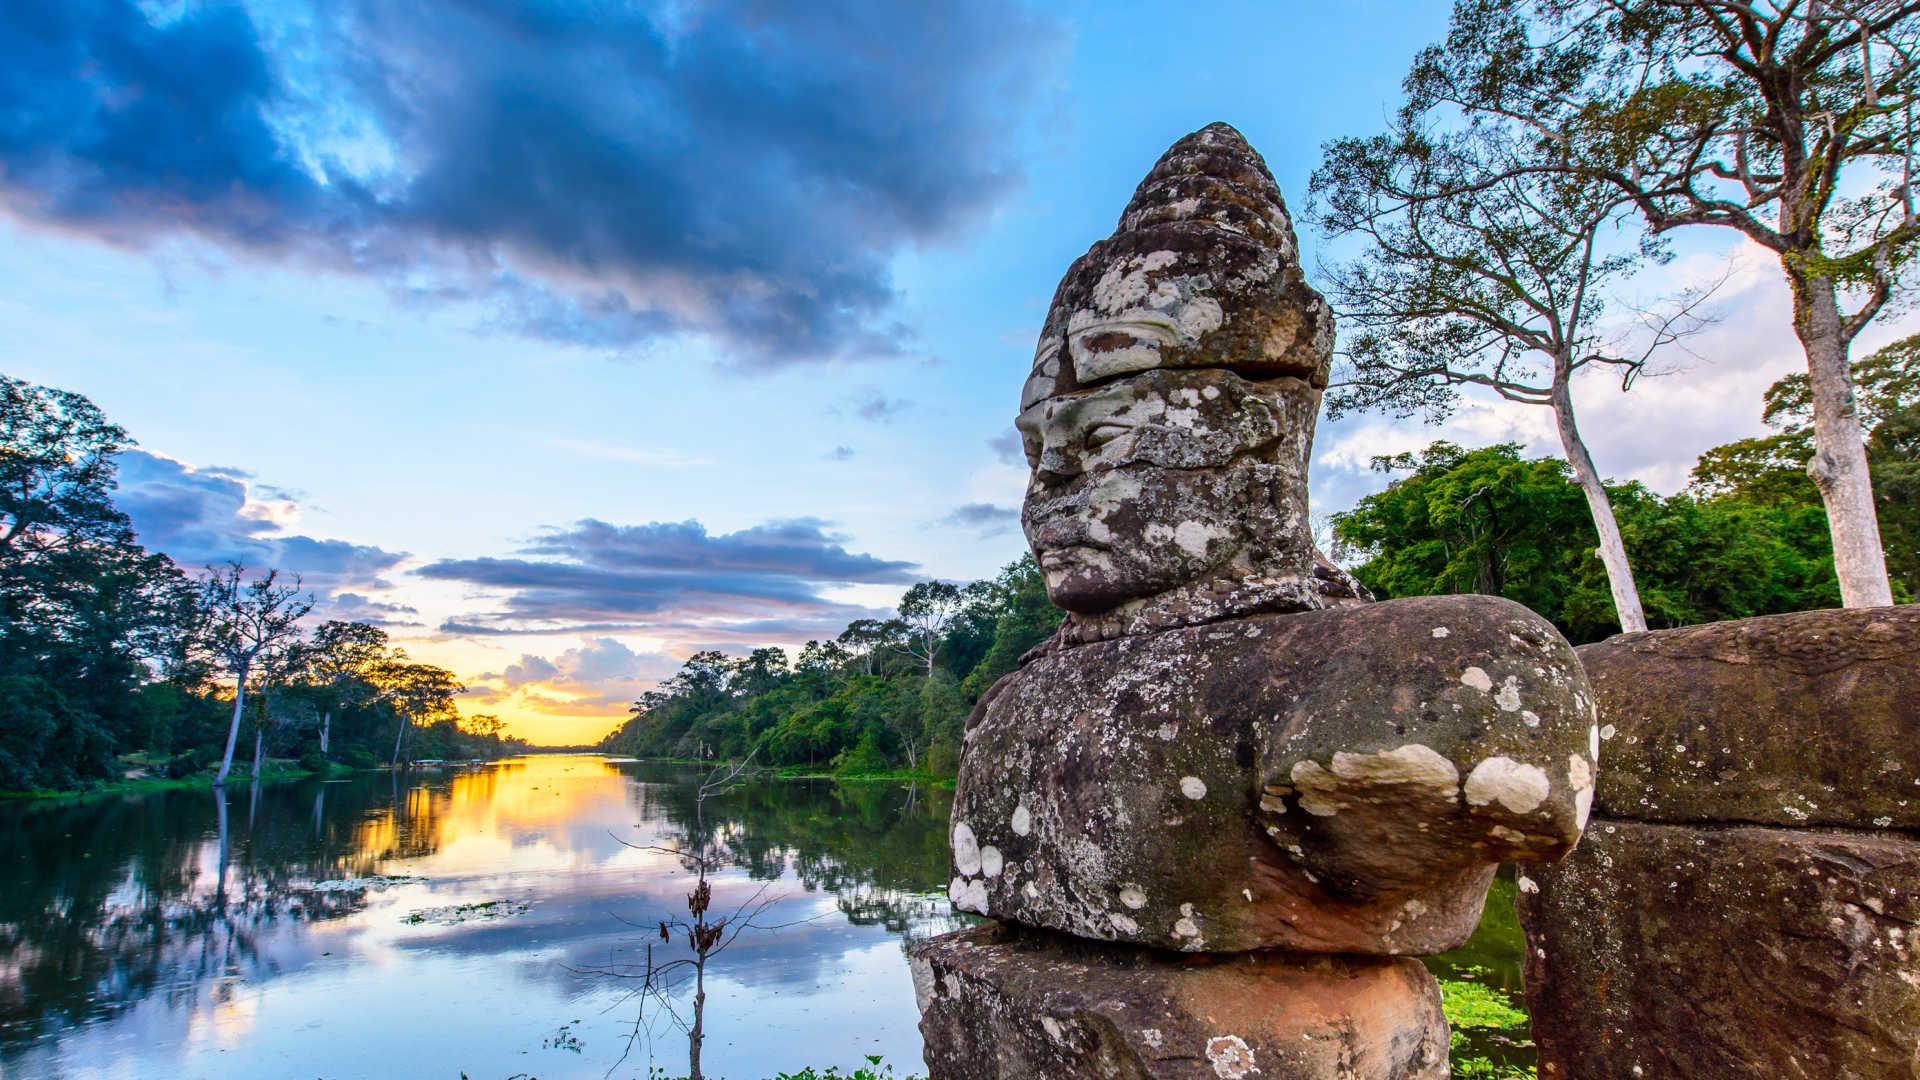 cambodia-image